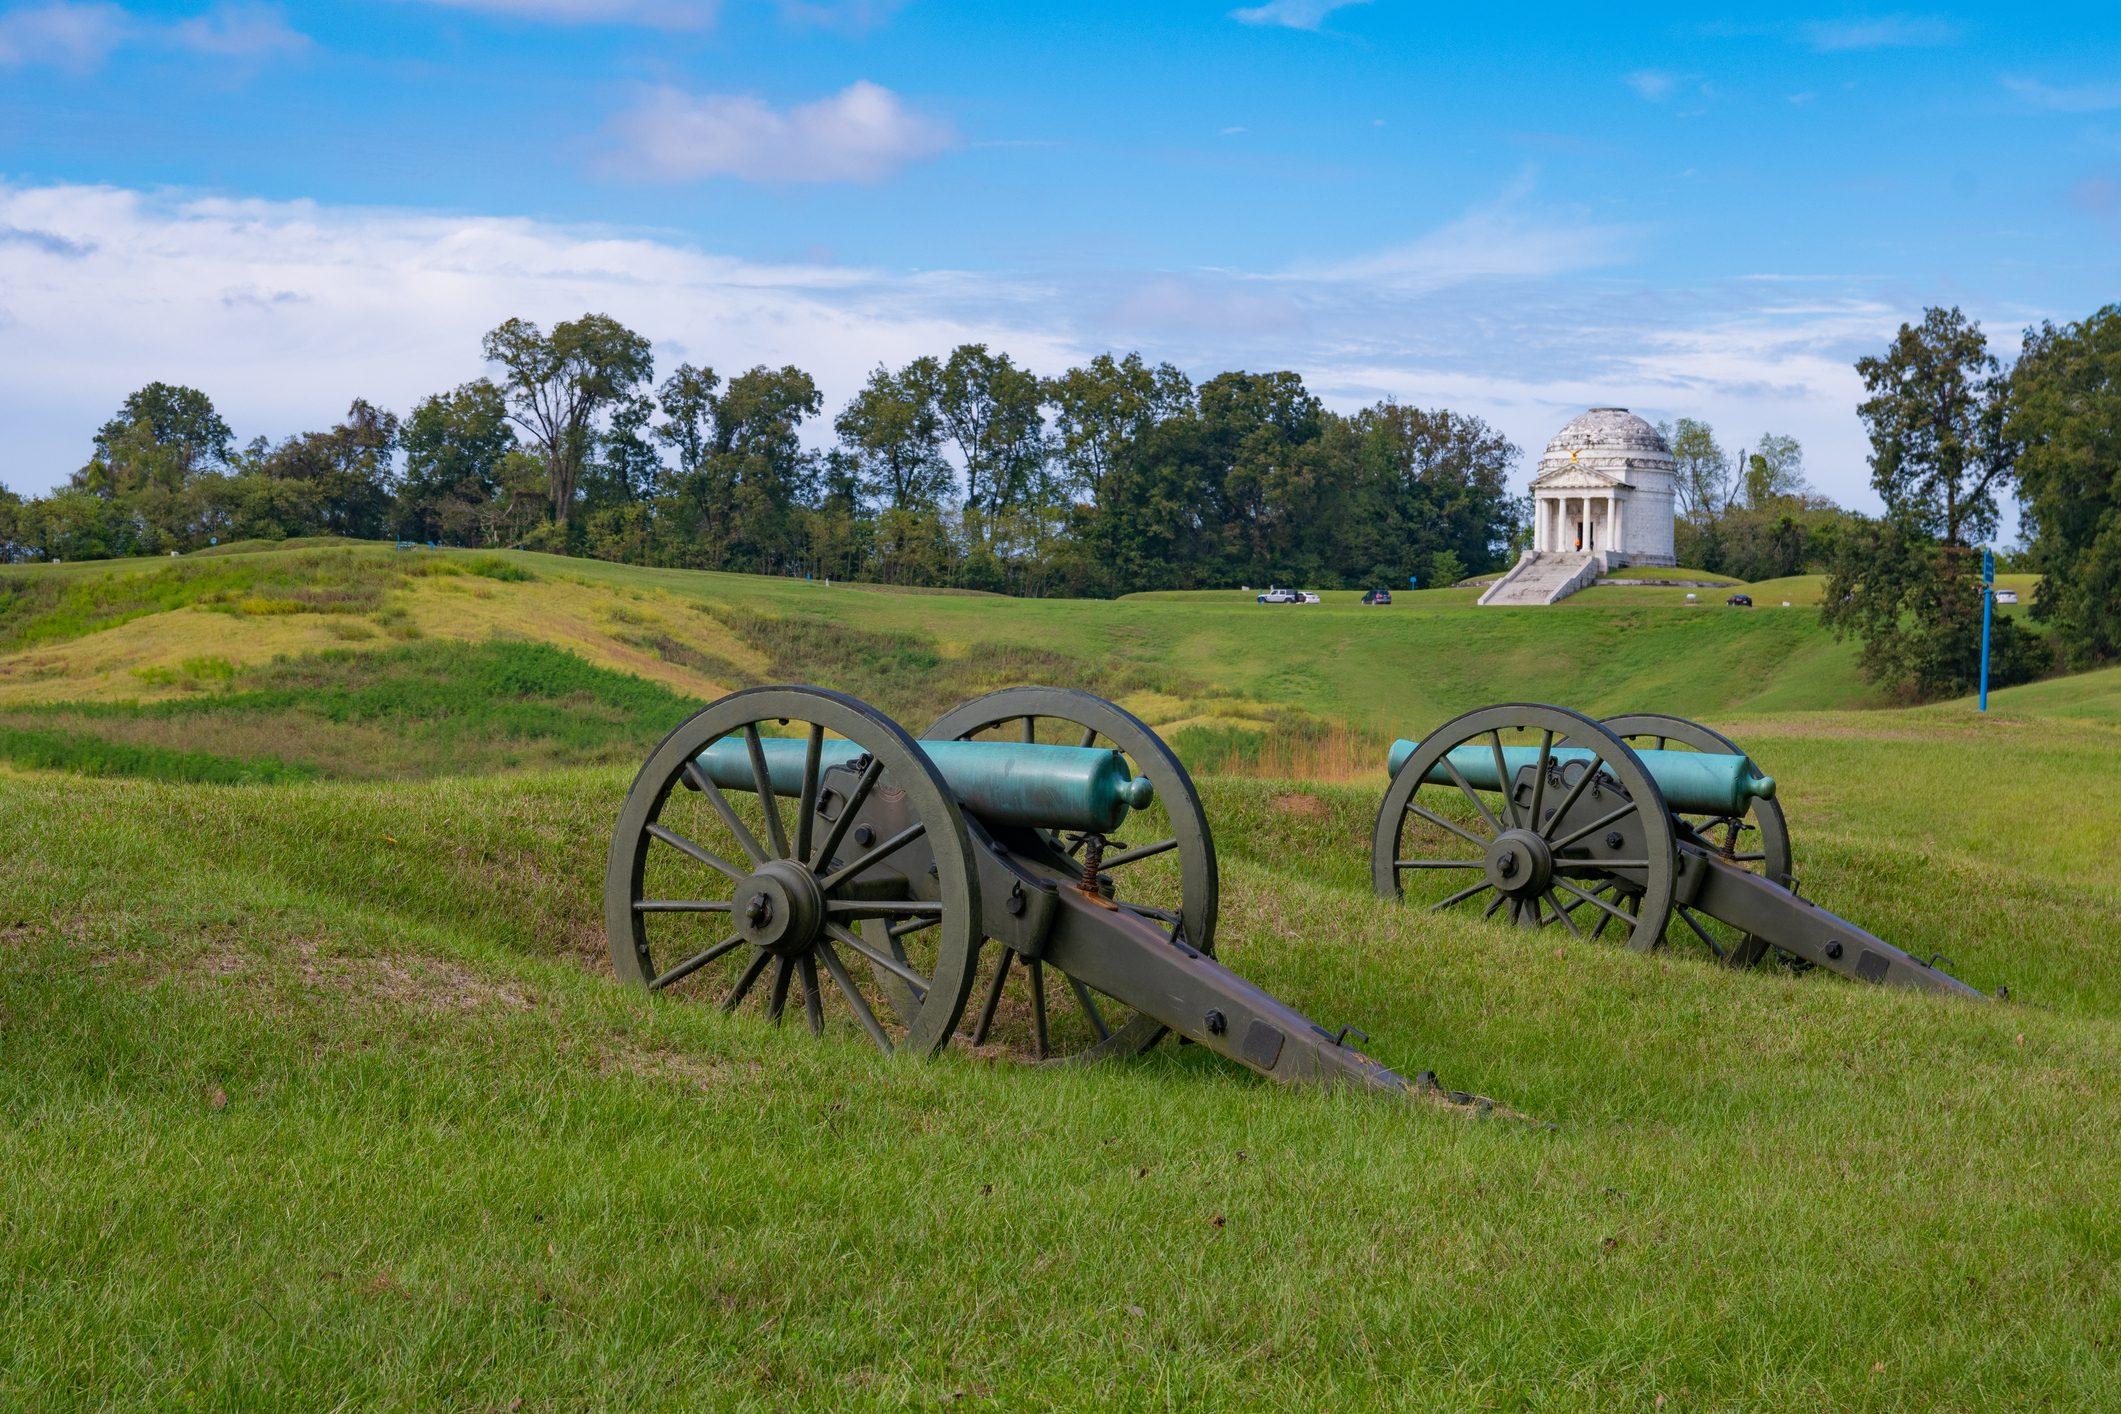 Civil War Cannons at Vicksburg National Military Park in Vicksburg, Mississippi.